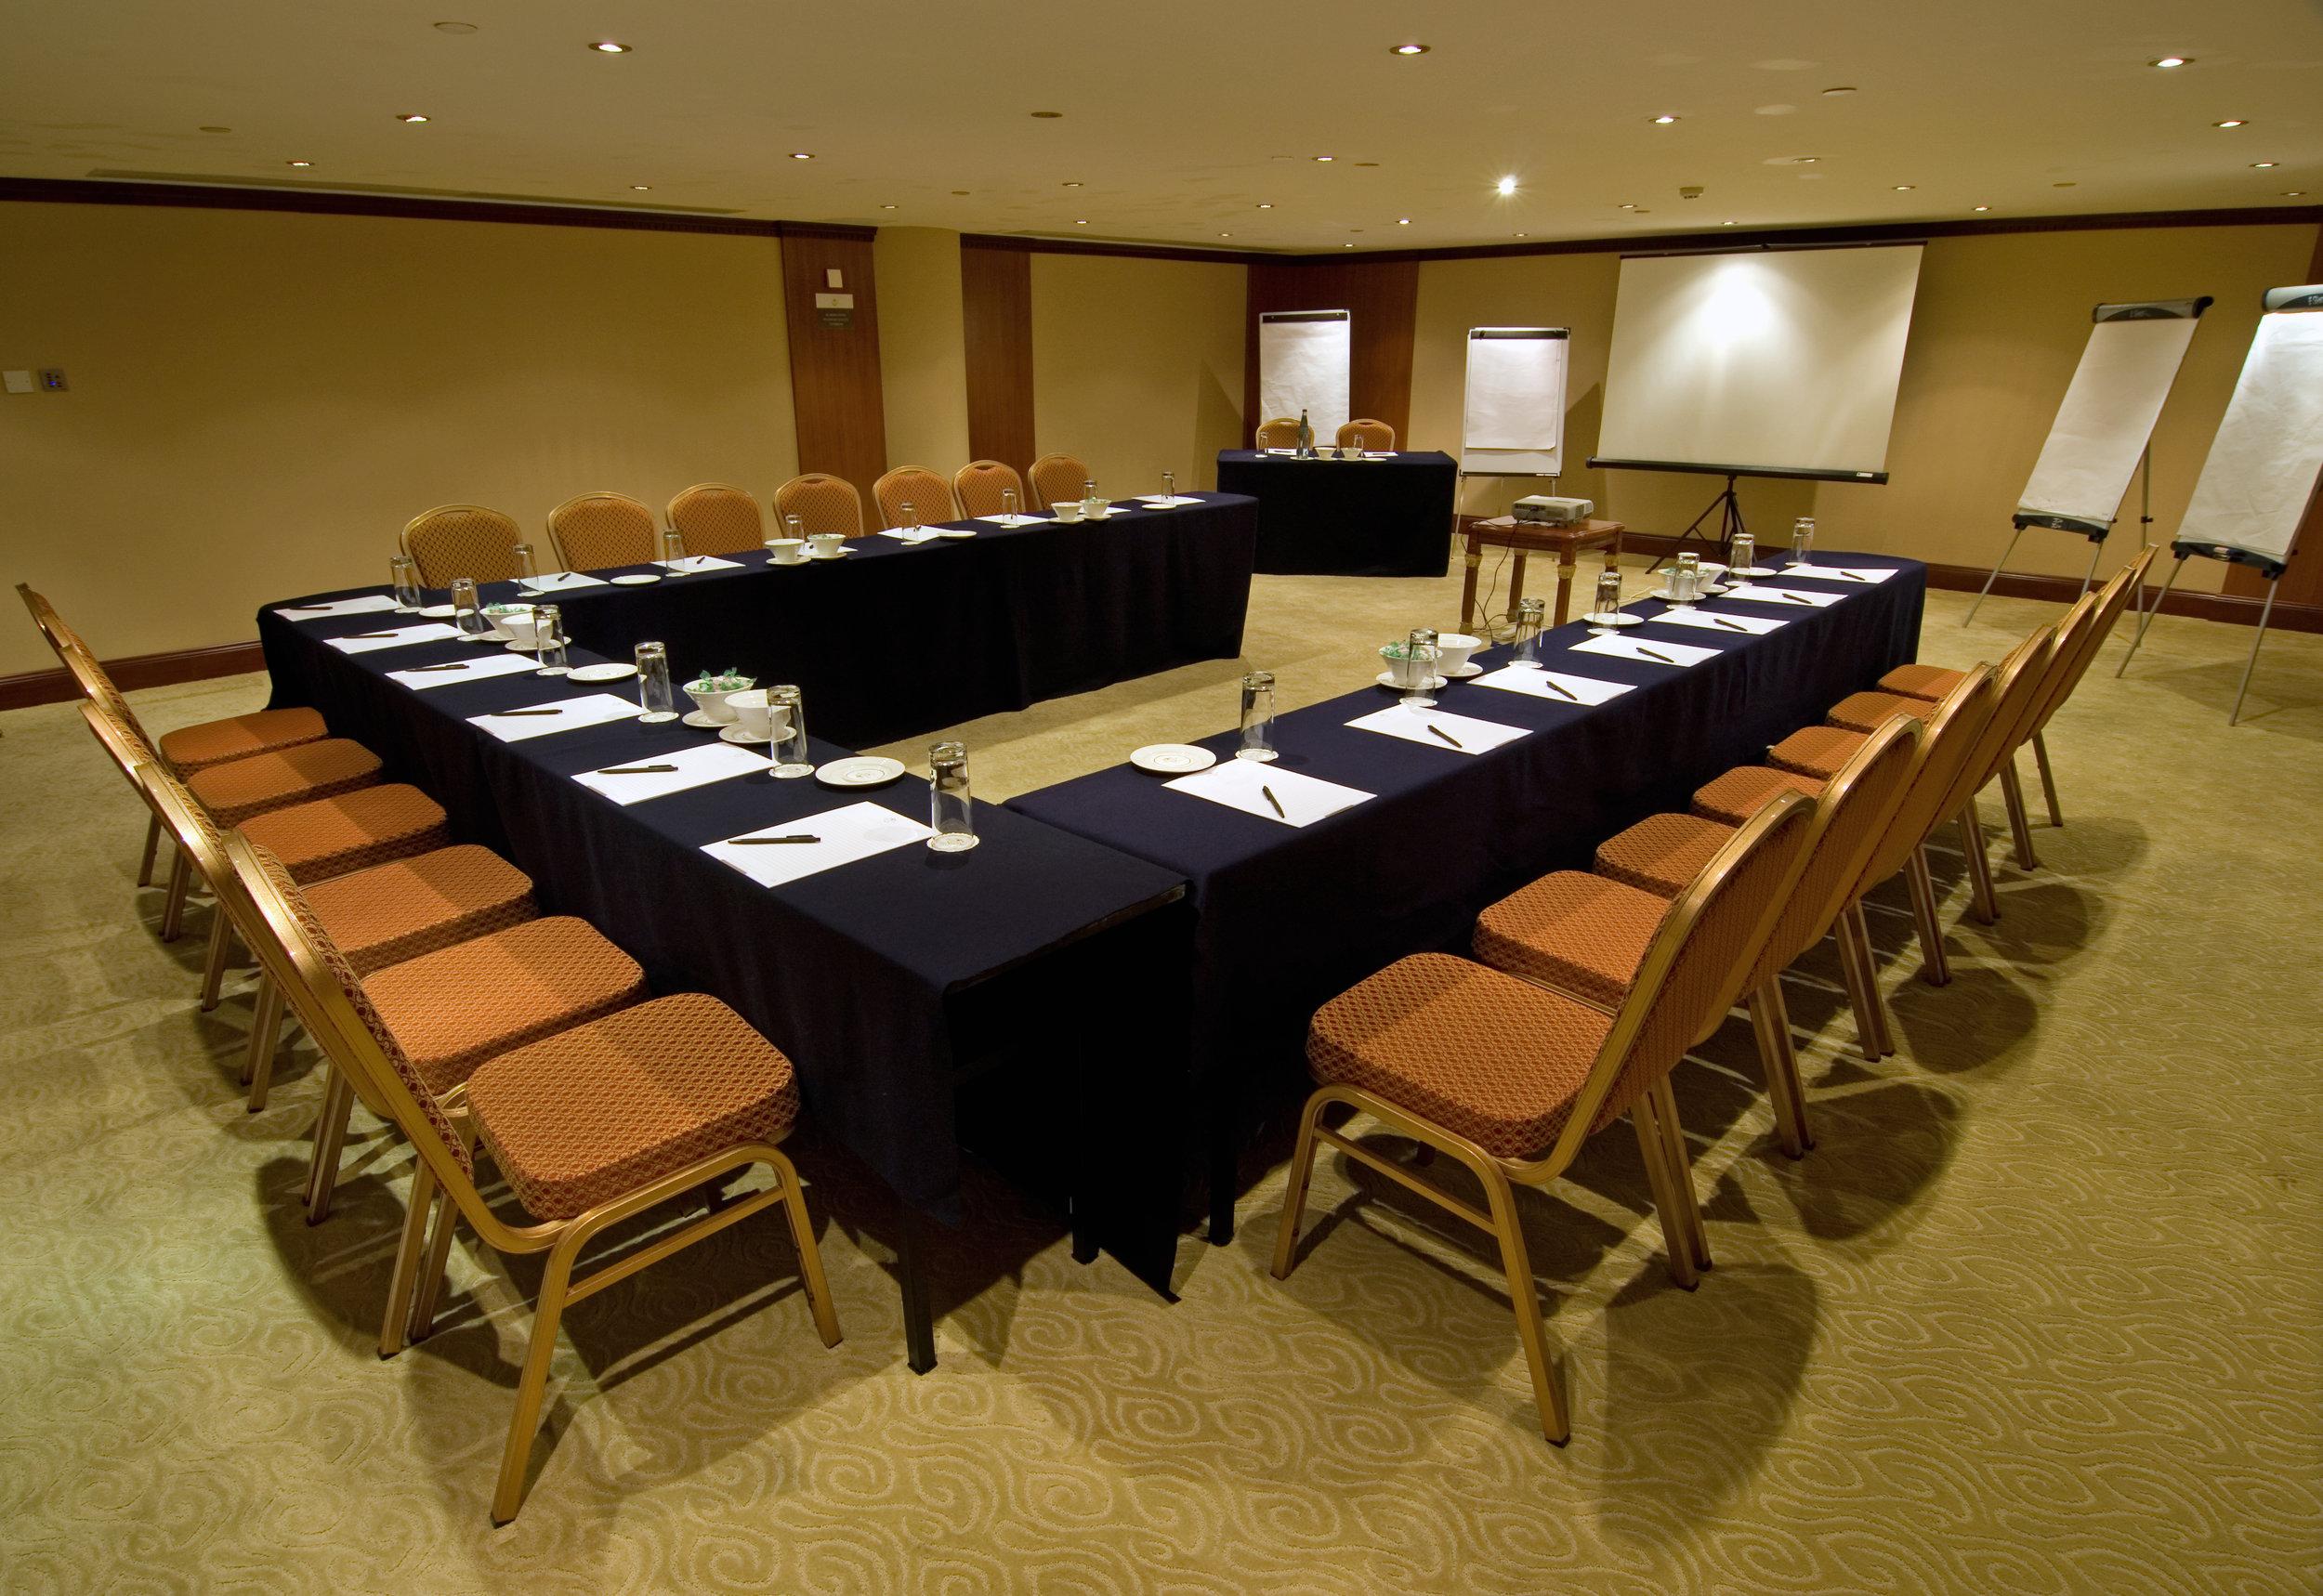 Grand Hotel Excelsior Meeting Room.jpg